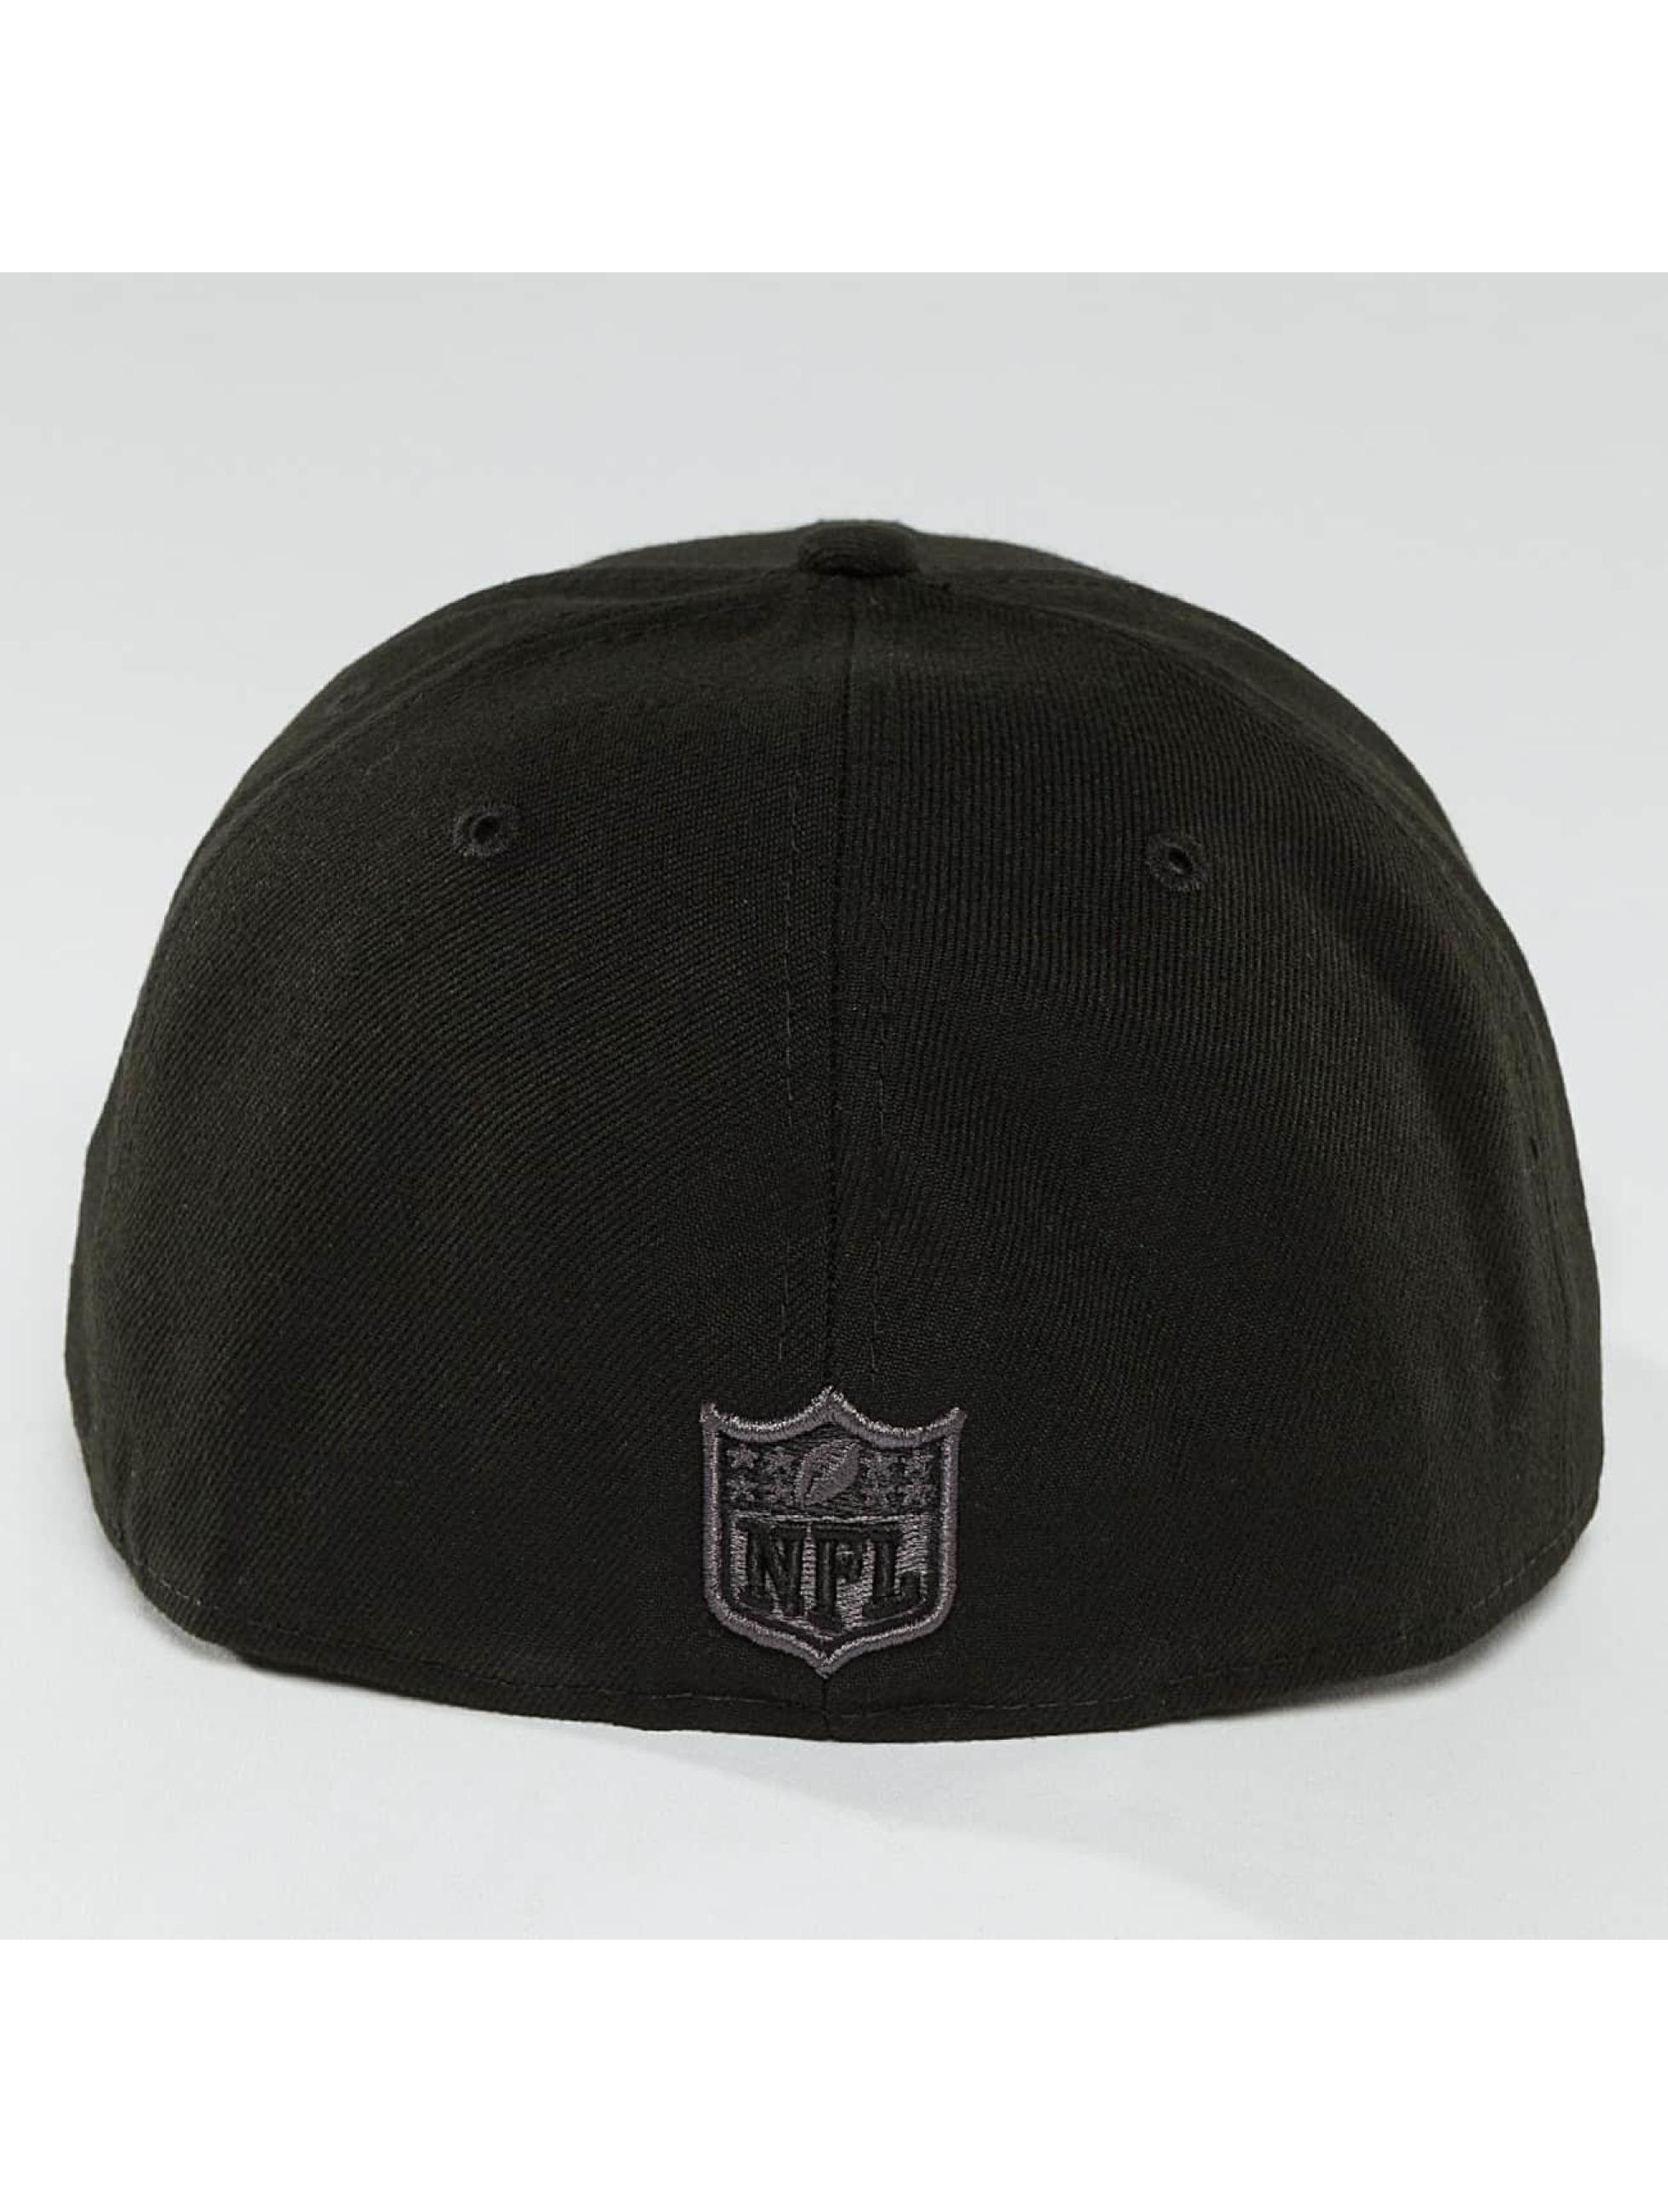 New Era Fitted Cap Black Graphite New England Patriots 59Fifty zwart